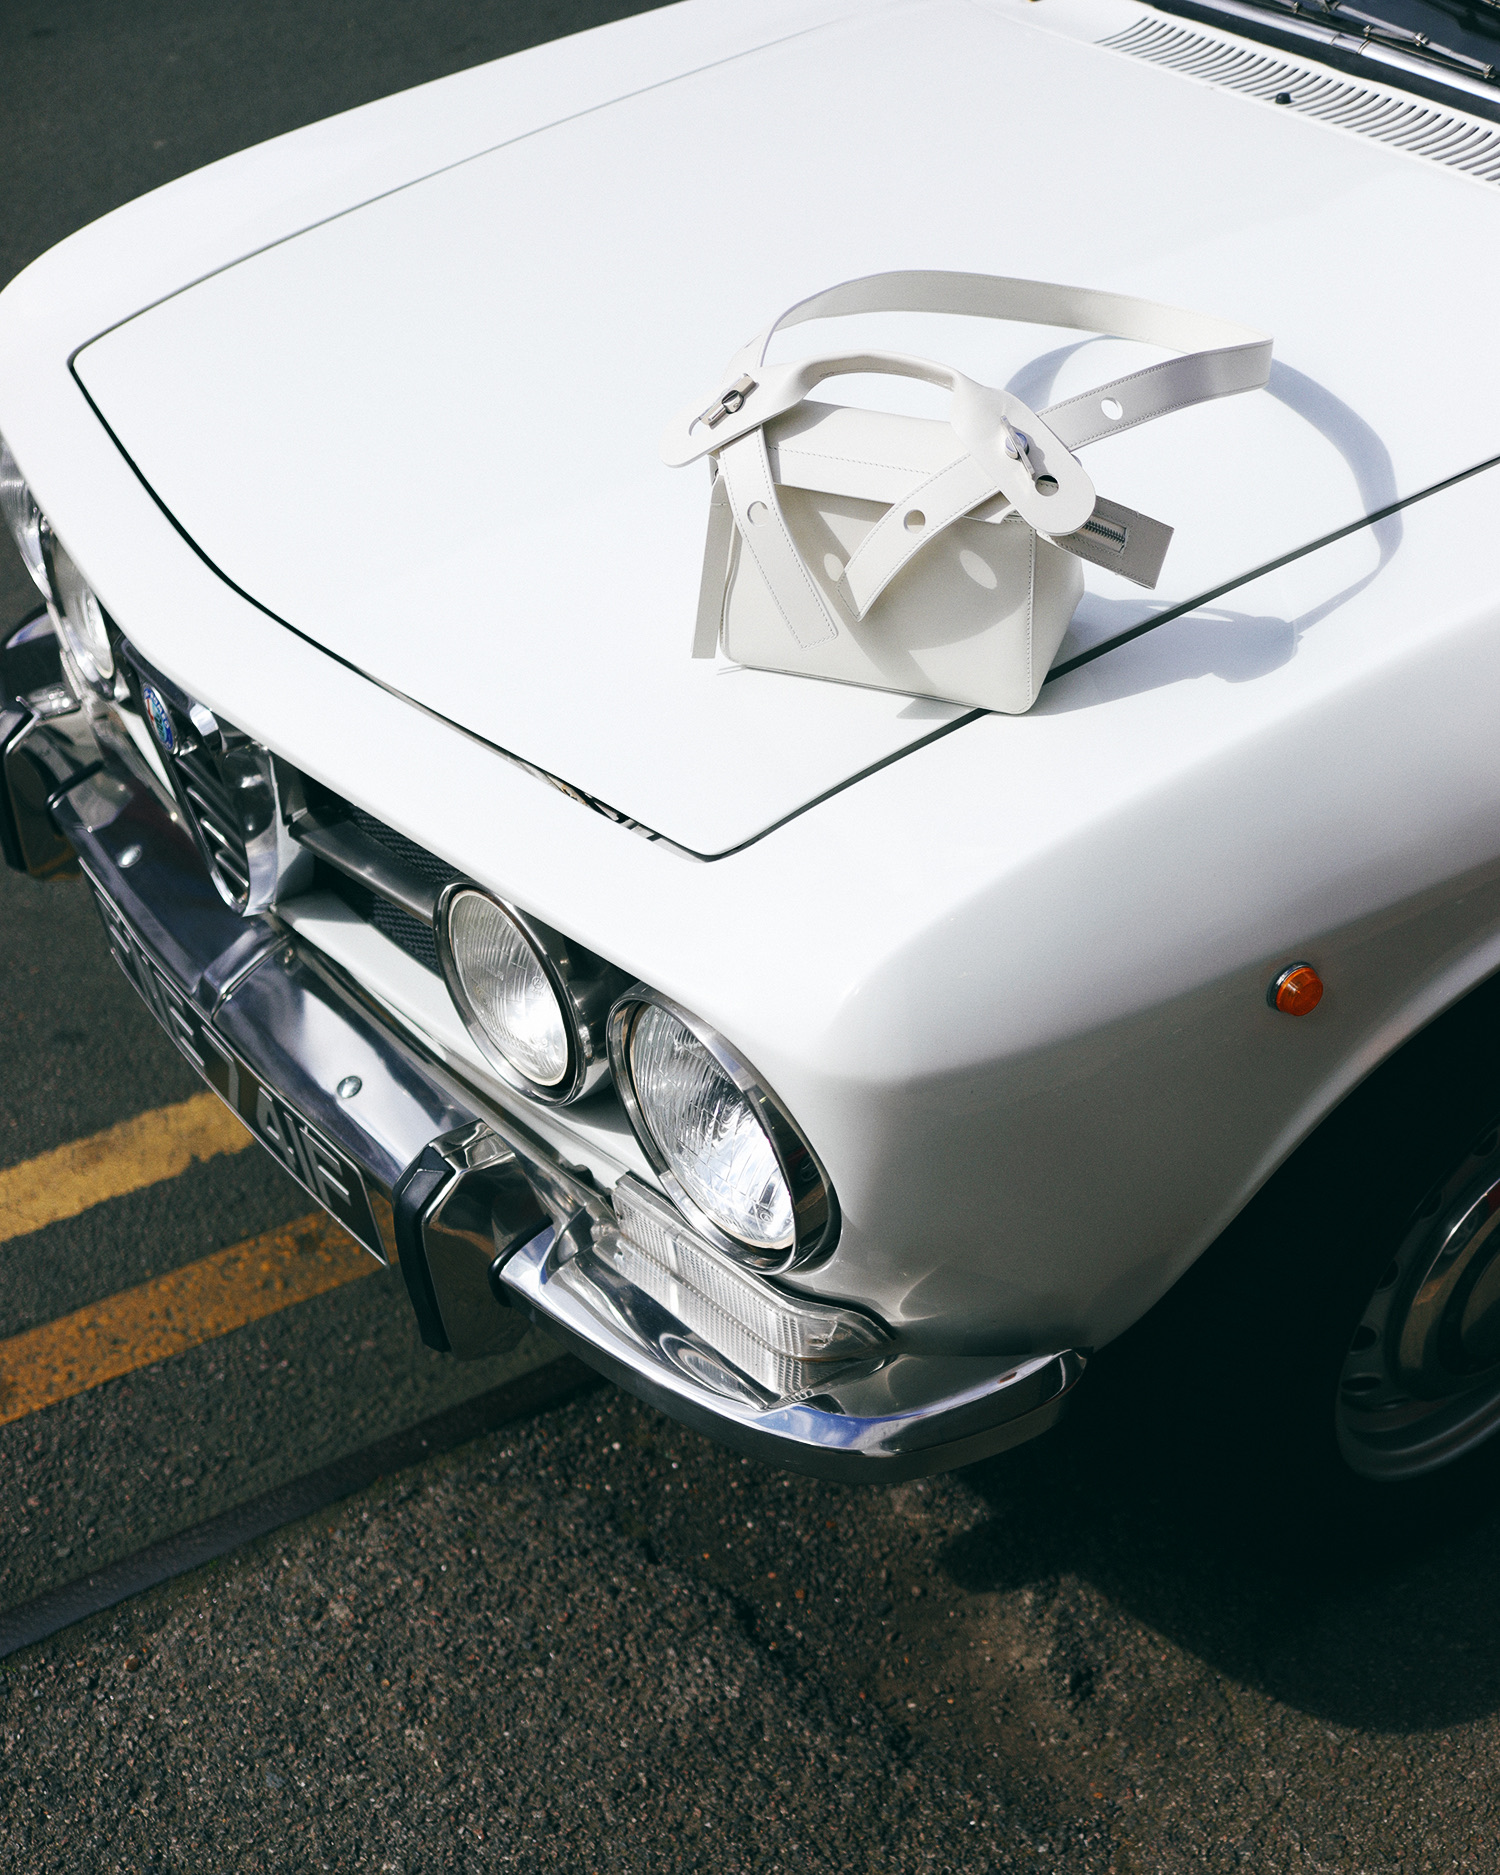 White car fashion shoot